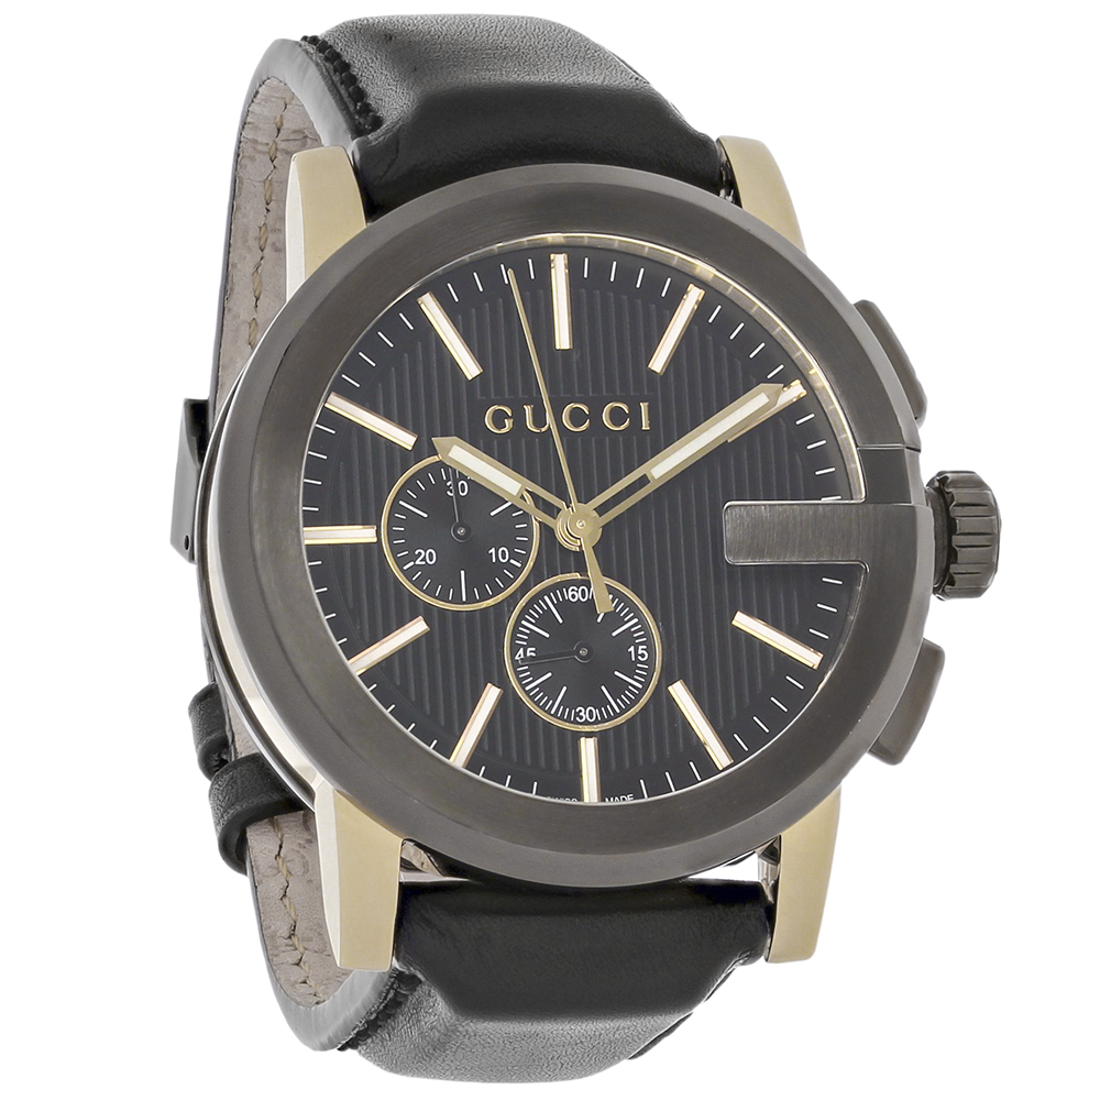 d1d52d64eab Gucci 101 G-Case Mens Black Leather Swiss Quartz Chronograph Watch YA101203